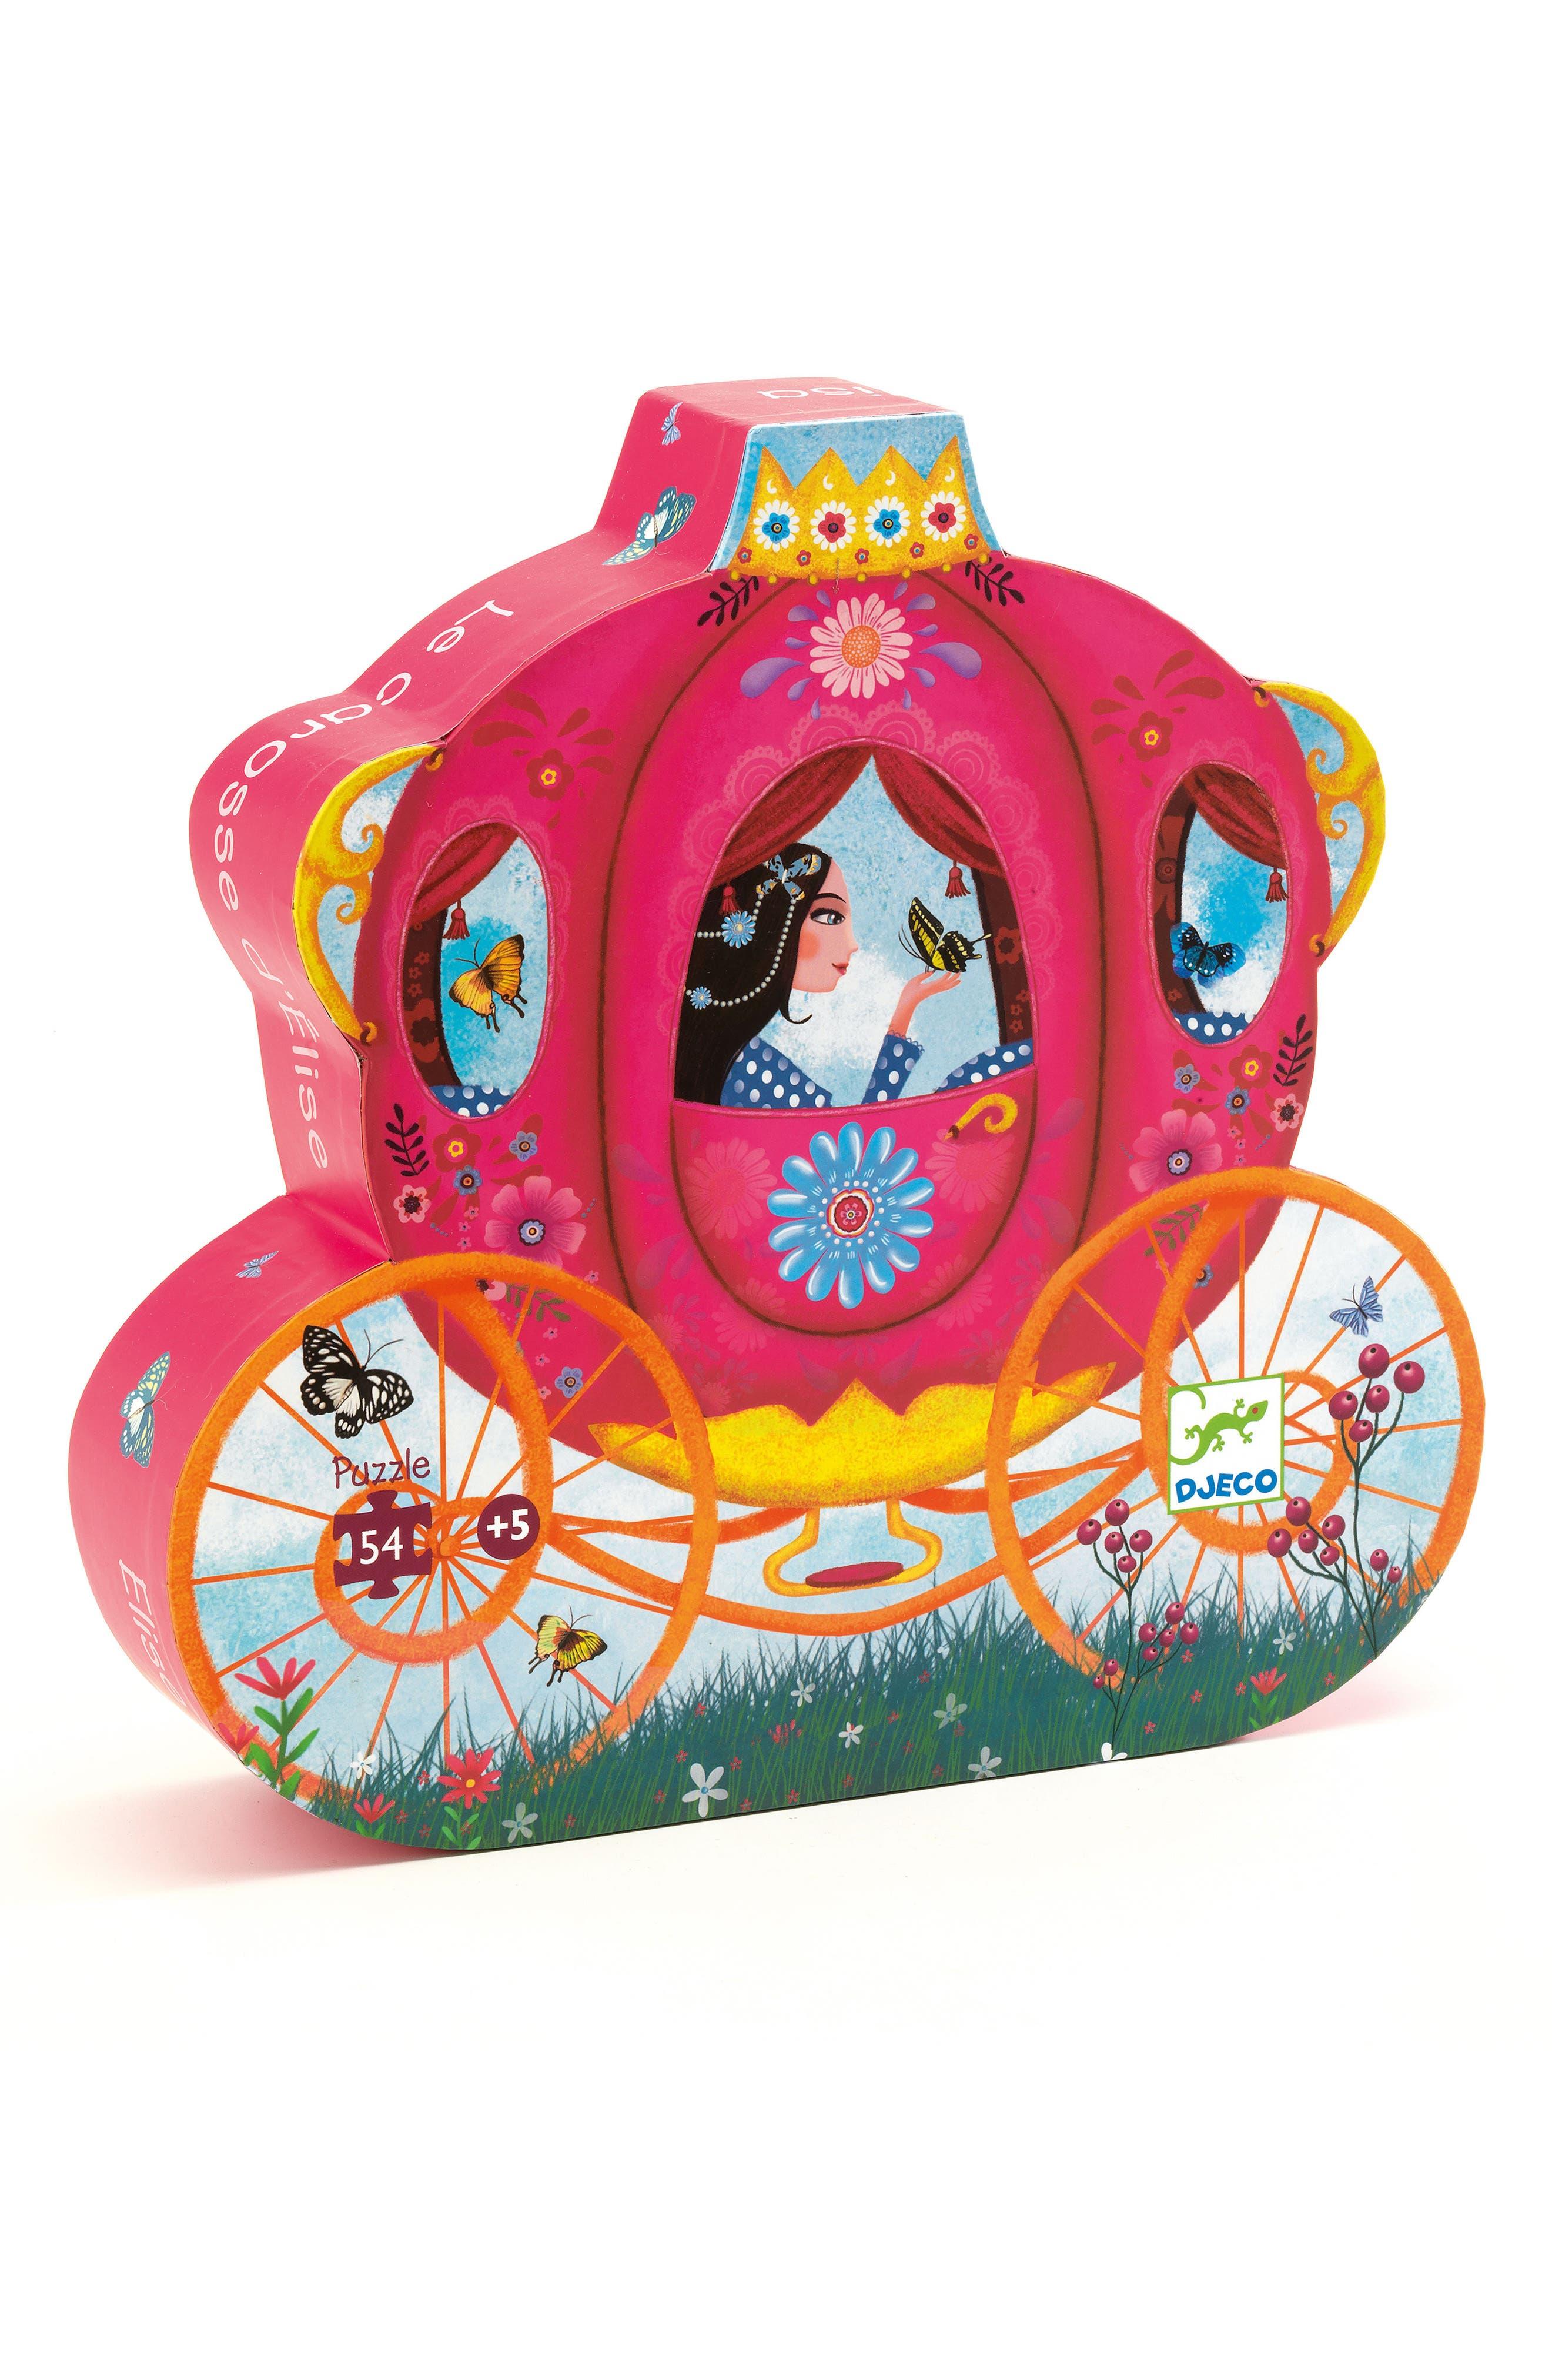 Girls Djeco Silhouette Puzzles Elises Carriage 54Piece Puzzle